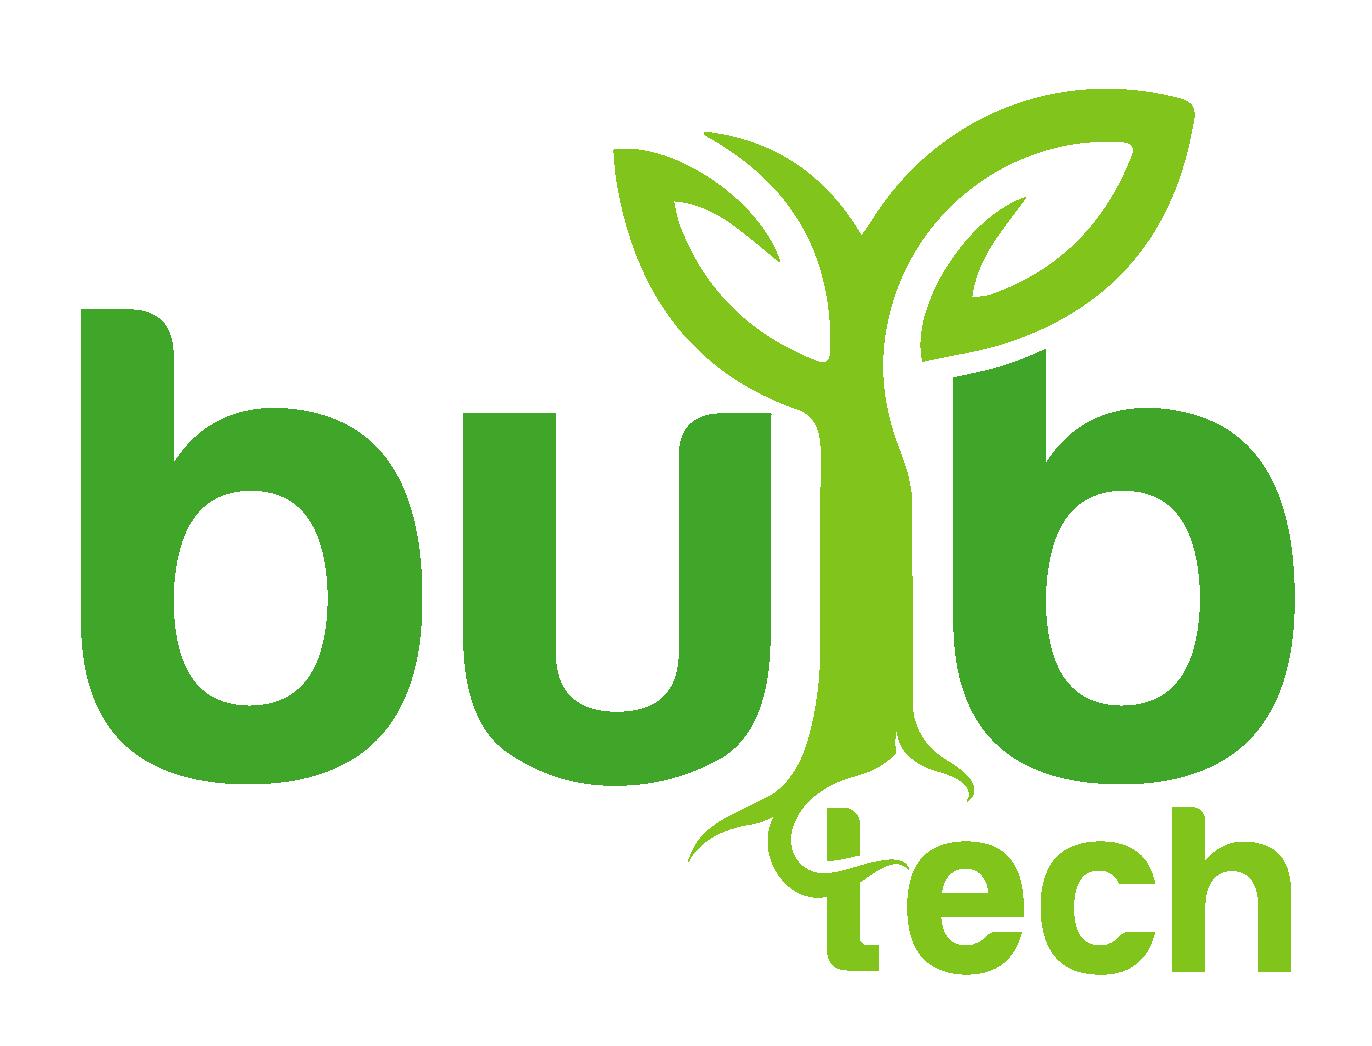 BulbTech Final Logo 2019 copy 2.png